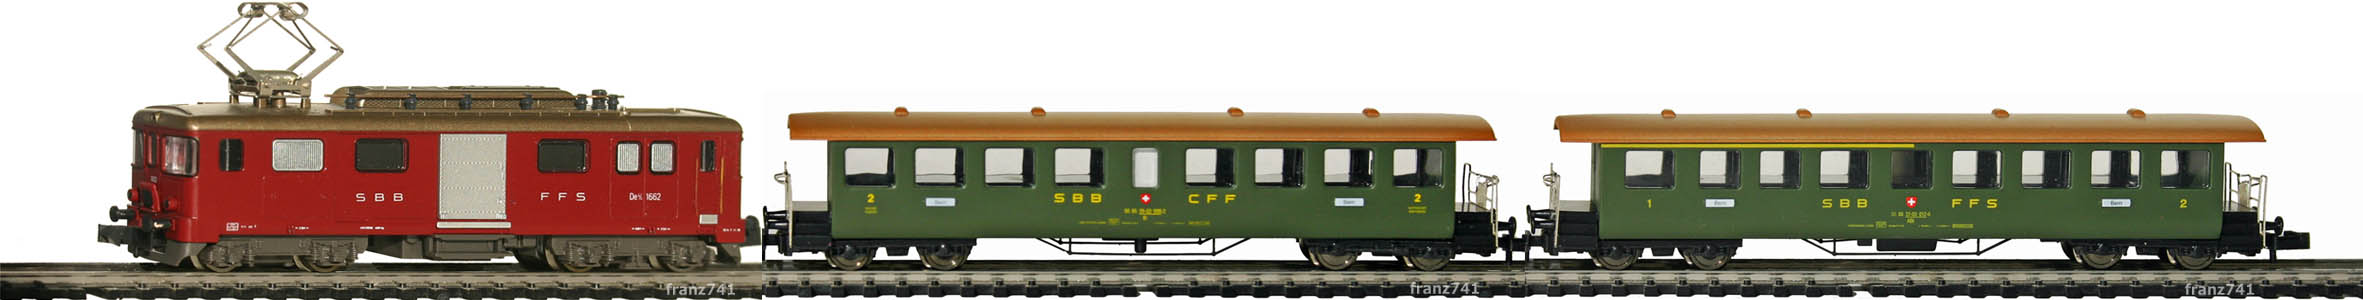 Epoche-IV-SBB-Seetal-Personenzug_De-4-4-ABi-Bi-Seetalwagen